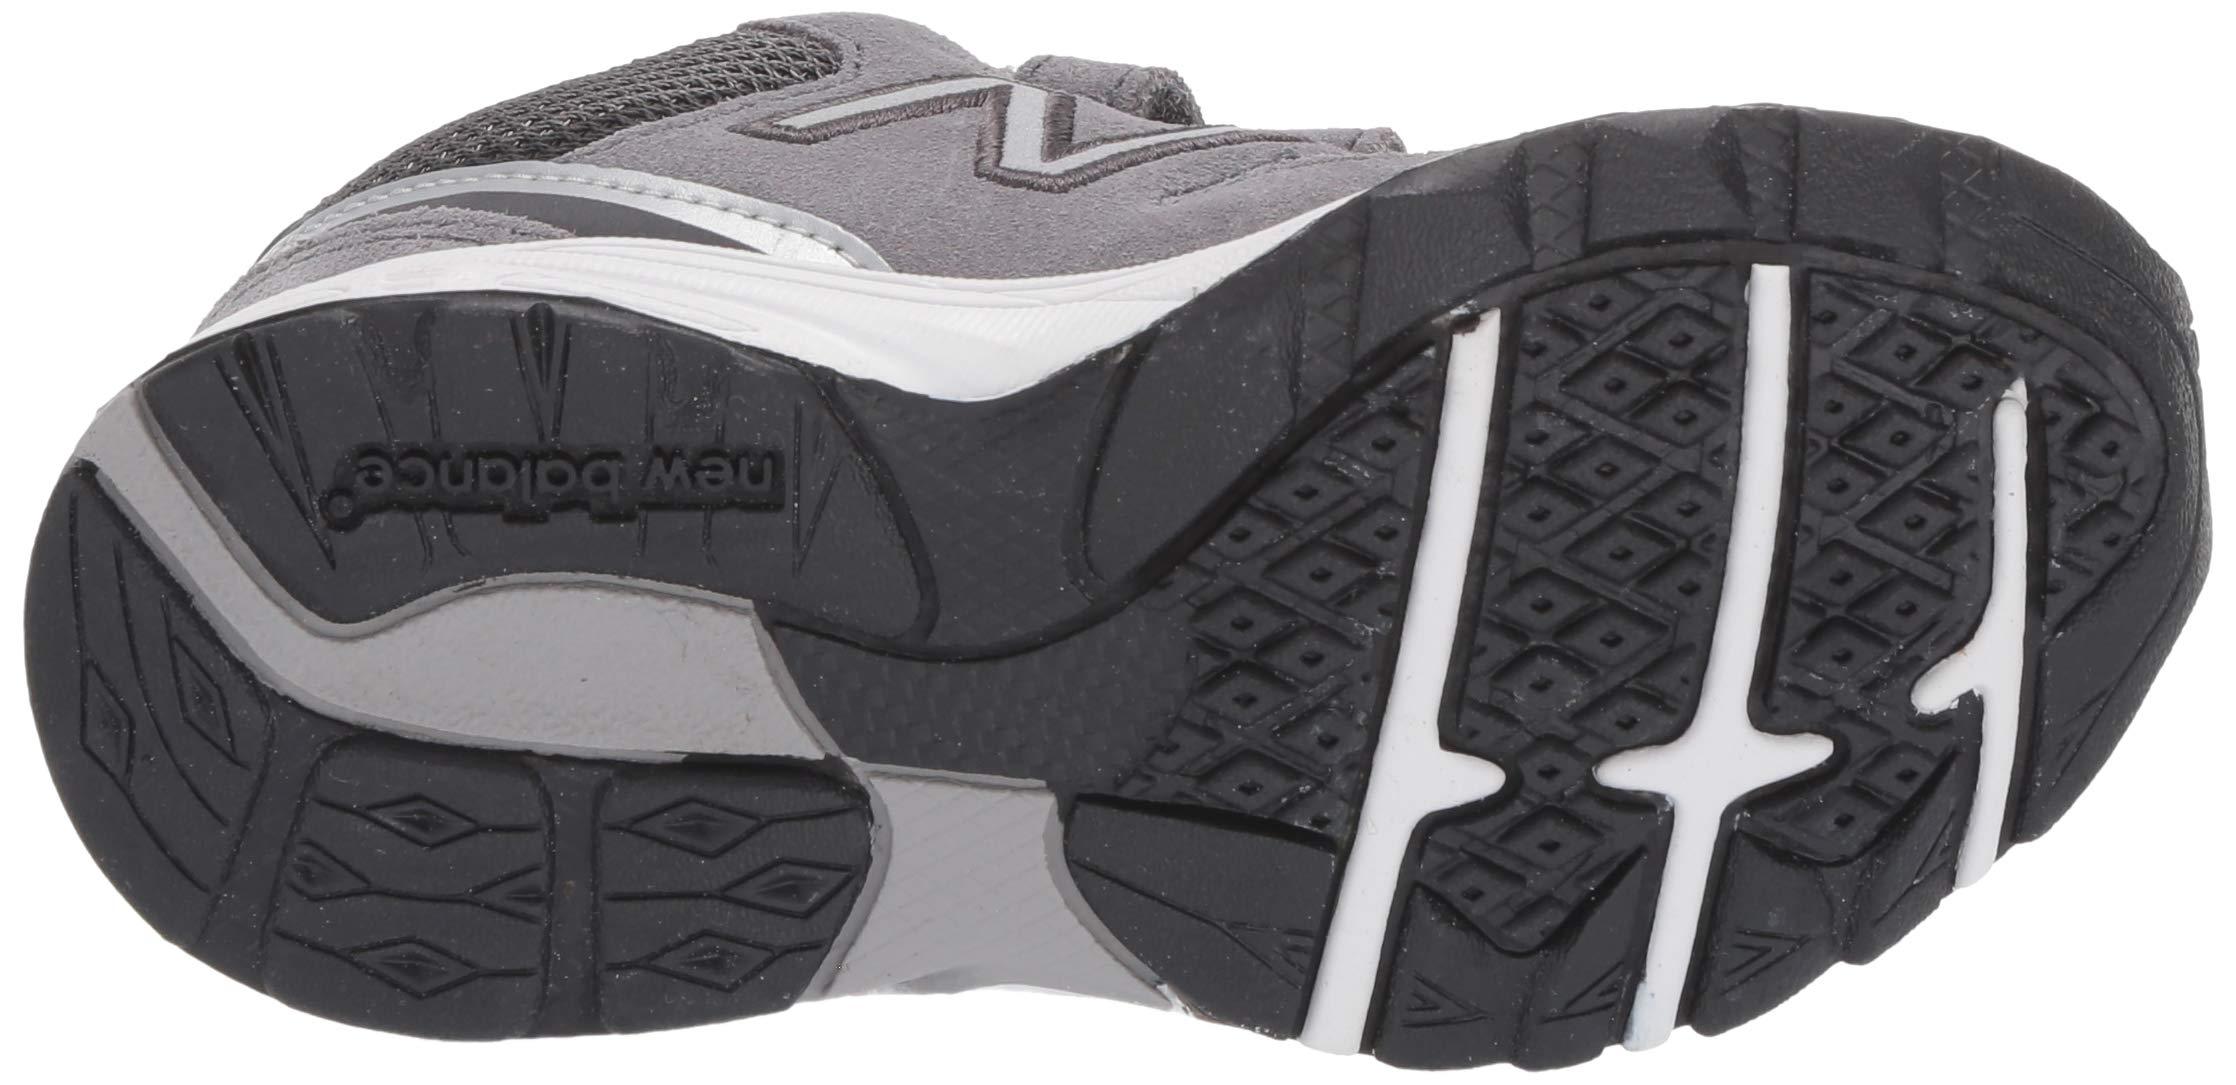 New Balance Boys' 888v2 Hook and Loop Running Shoe, Dark Grey, 2 M US Infant by New Balance (Image #3)